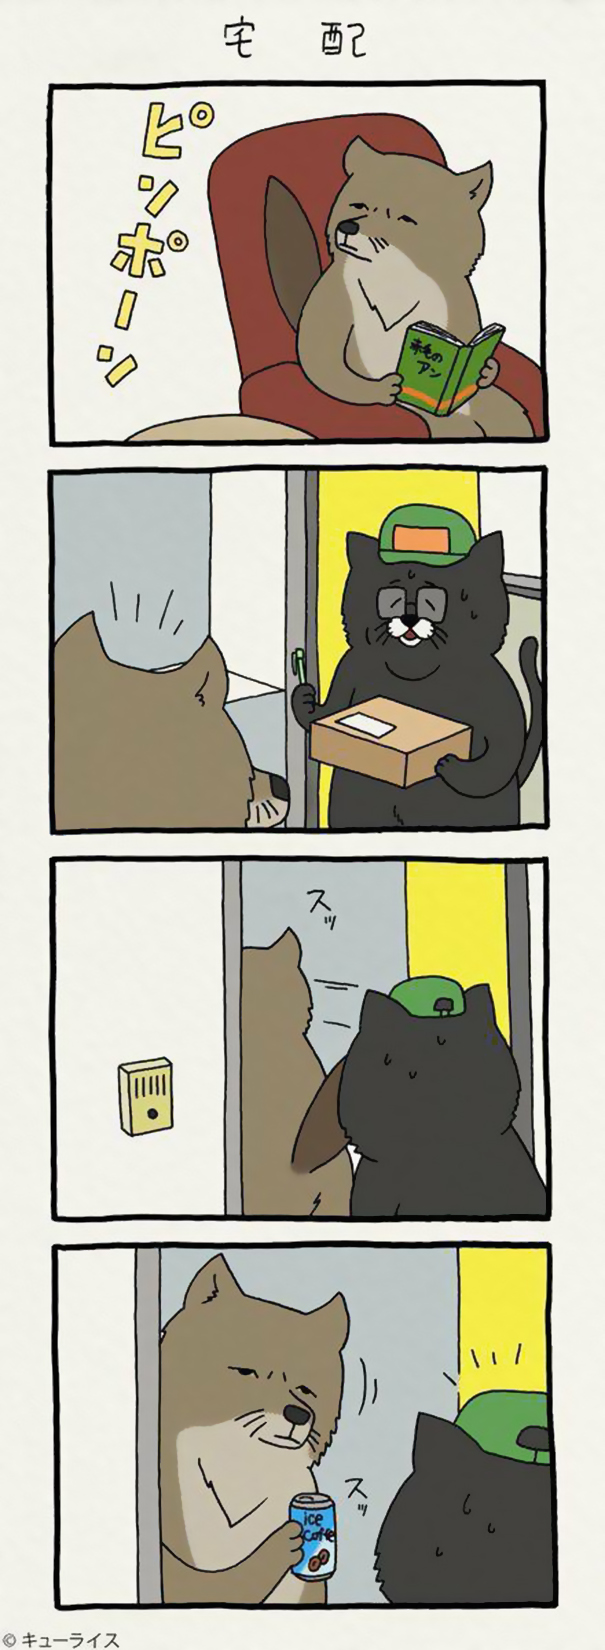 dog cartoon comics qrais japan 4 59895b2696a46  605 - 우울한 당신을 웃게 해줄 '착한 티벳 여우' 4컷 만화